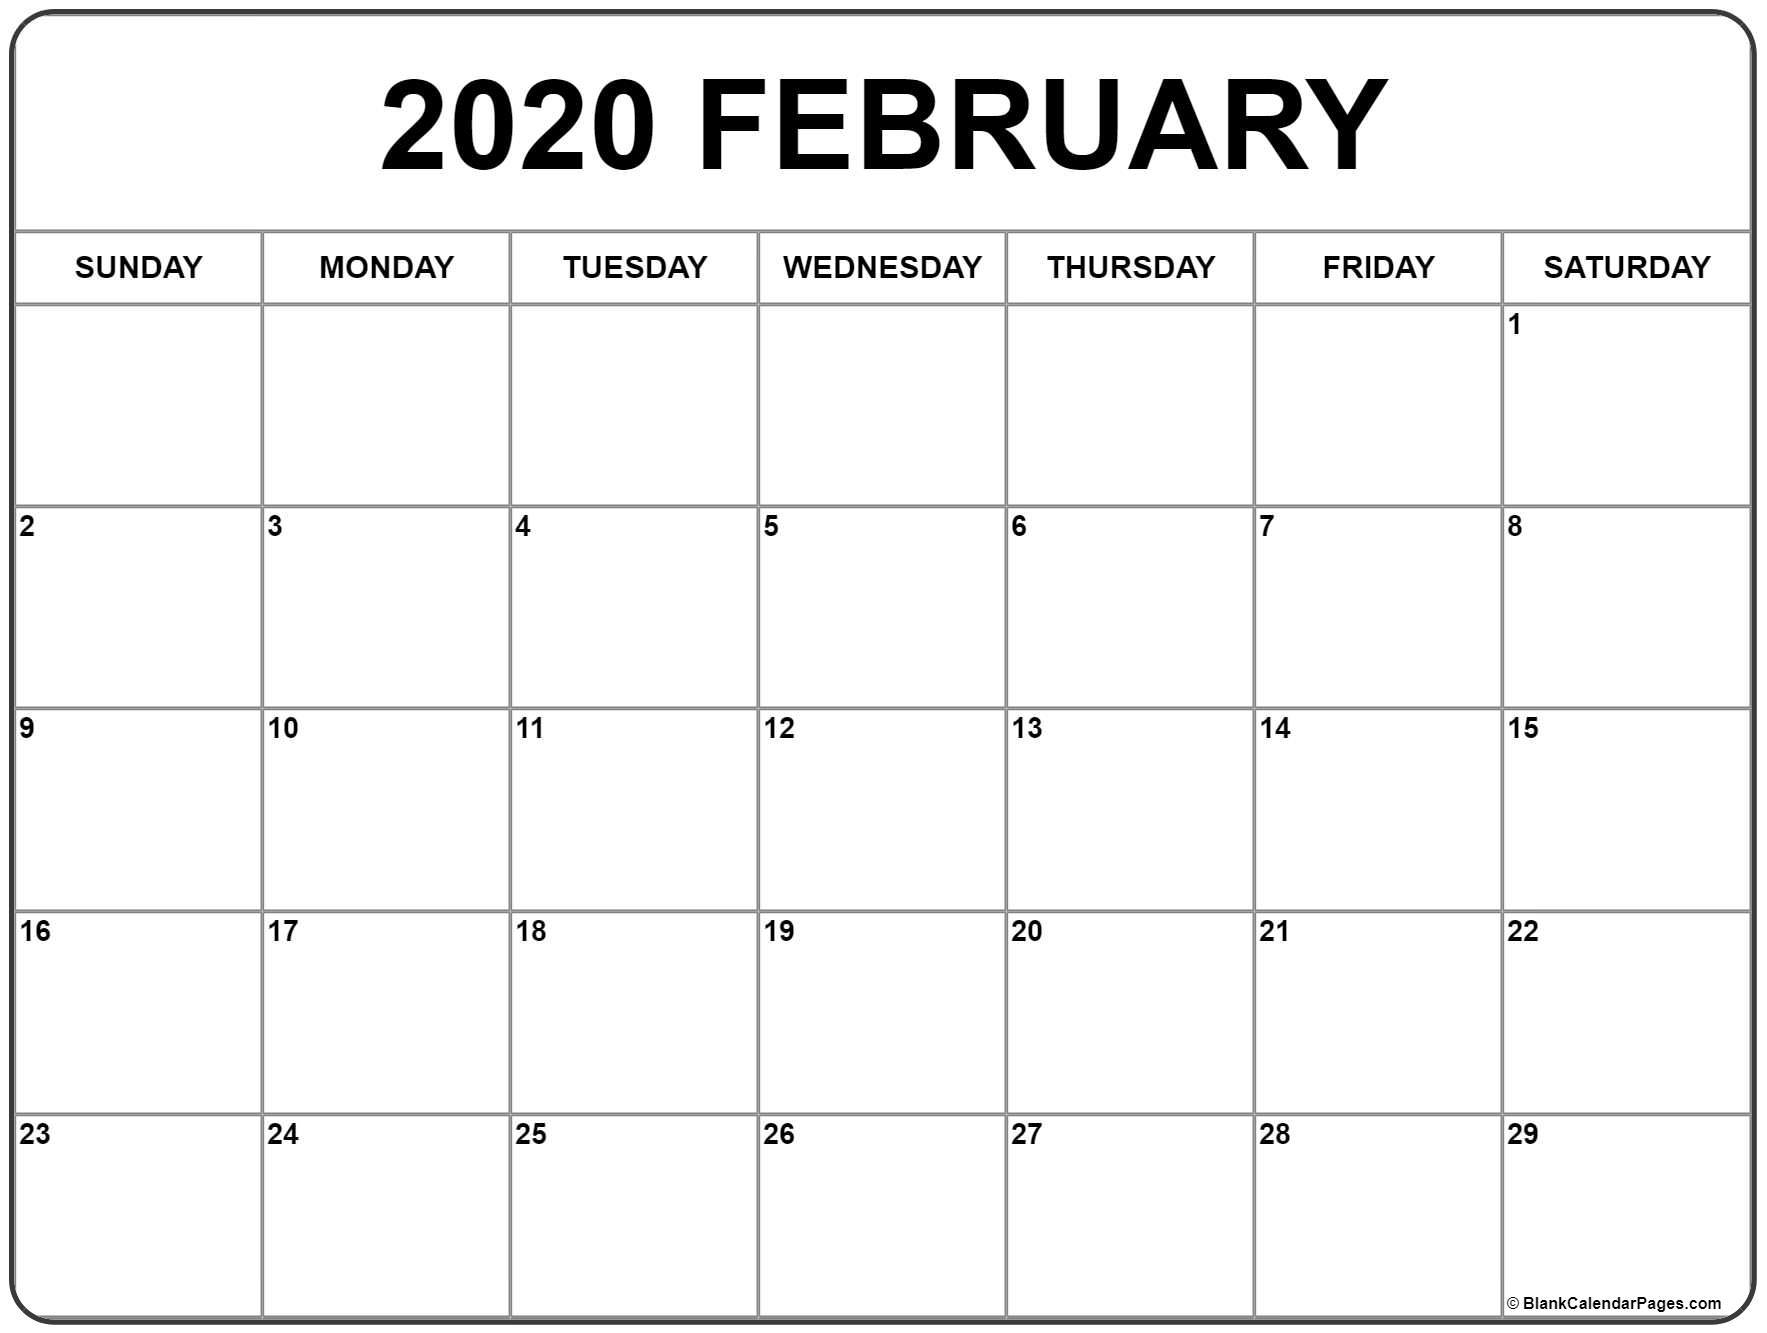 2020 Free Printable Calendar Large Numbers - Calendar Inspiration Design